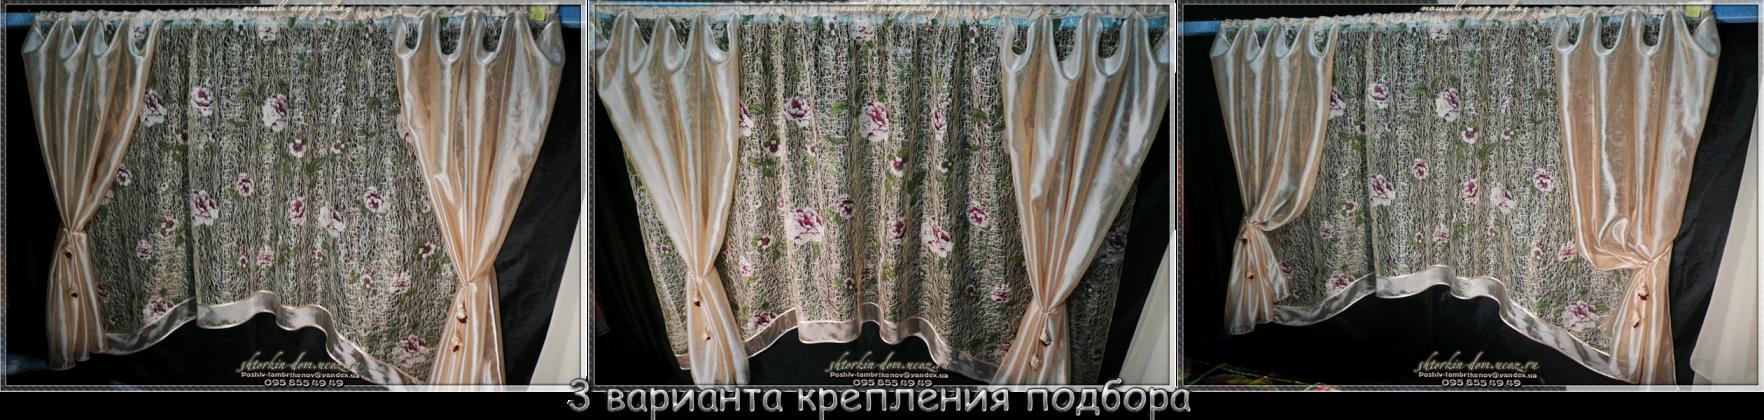 шторы. пошив штор